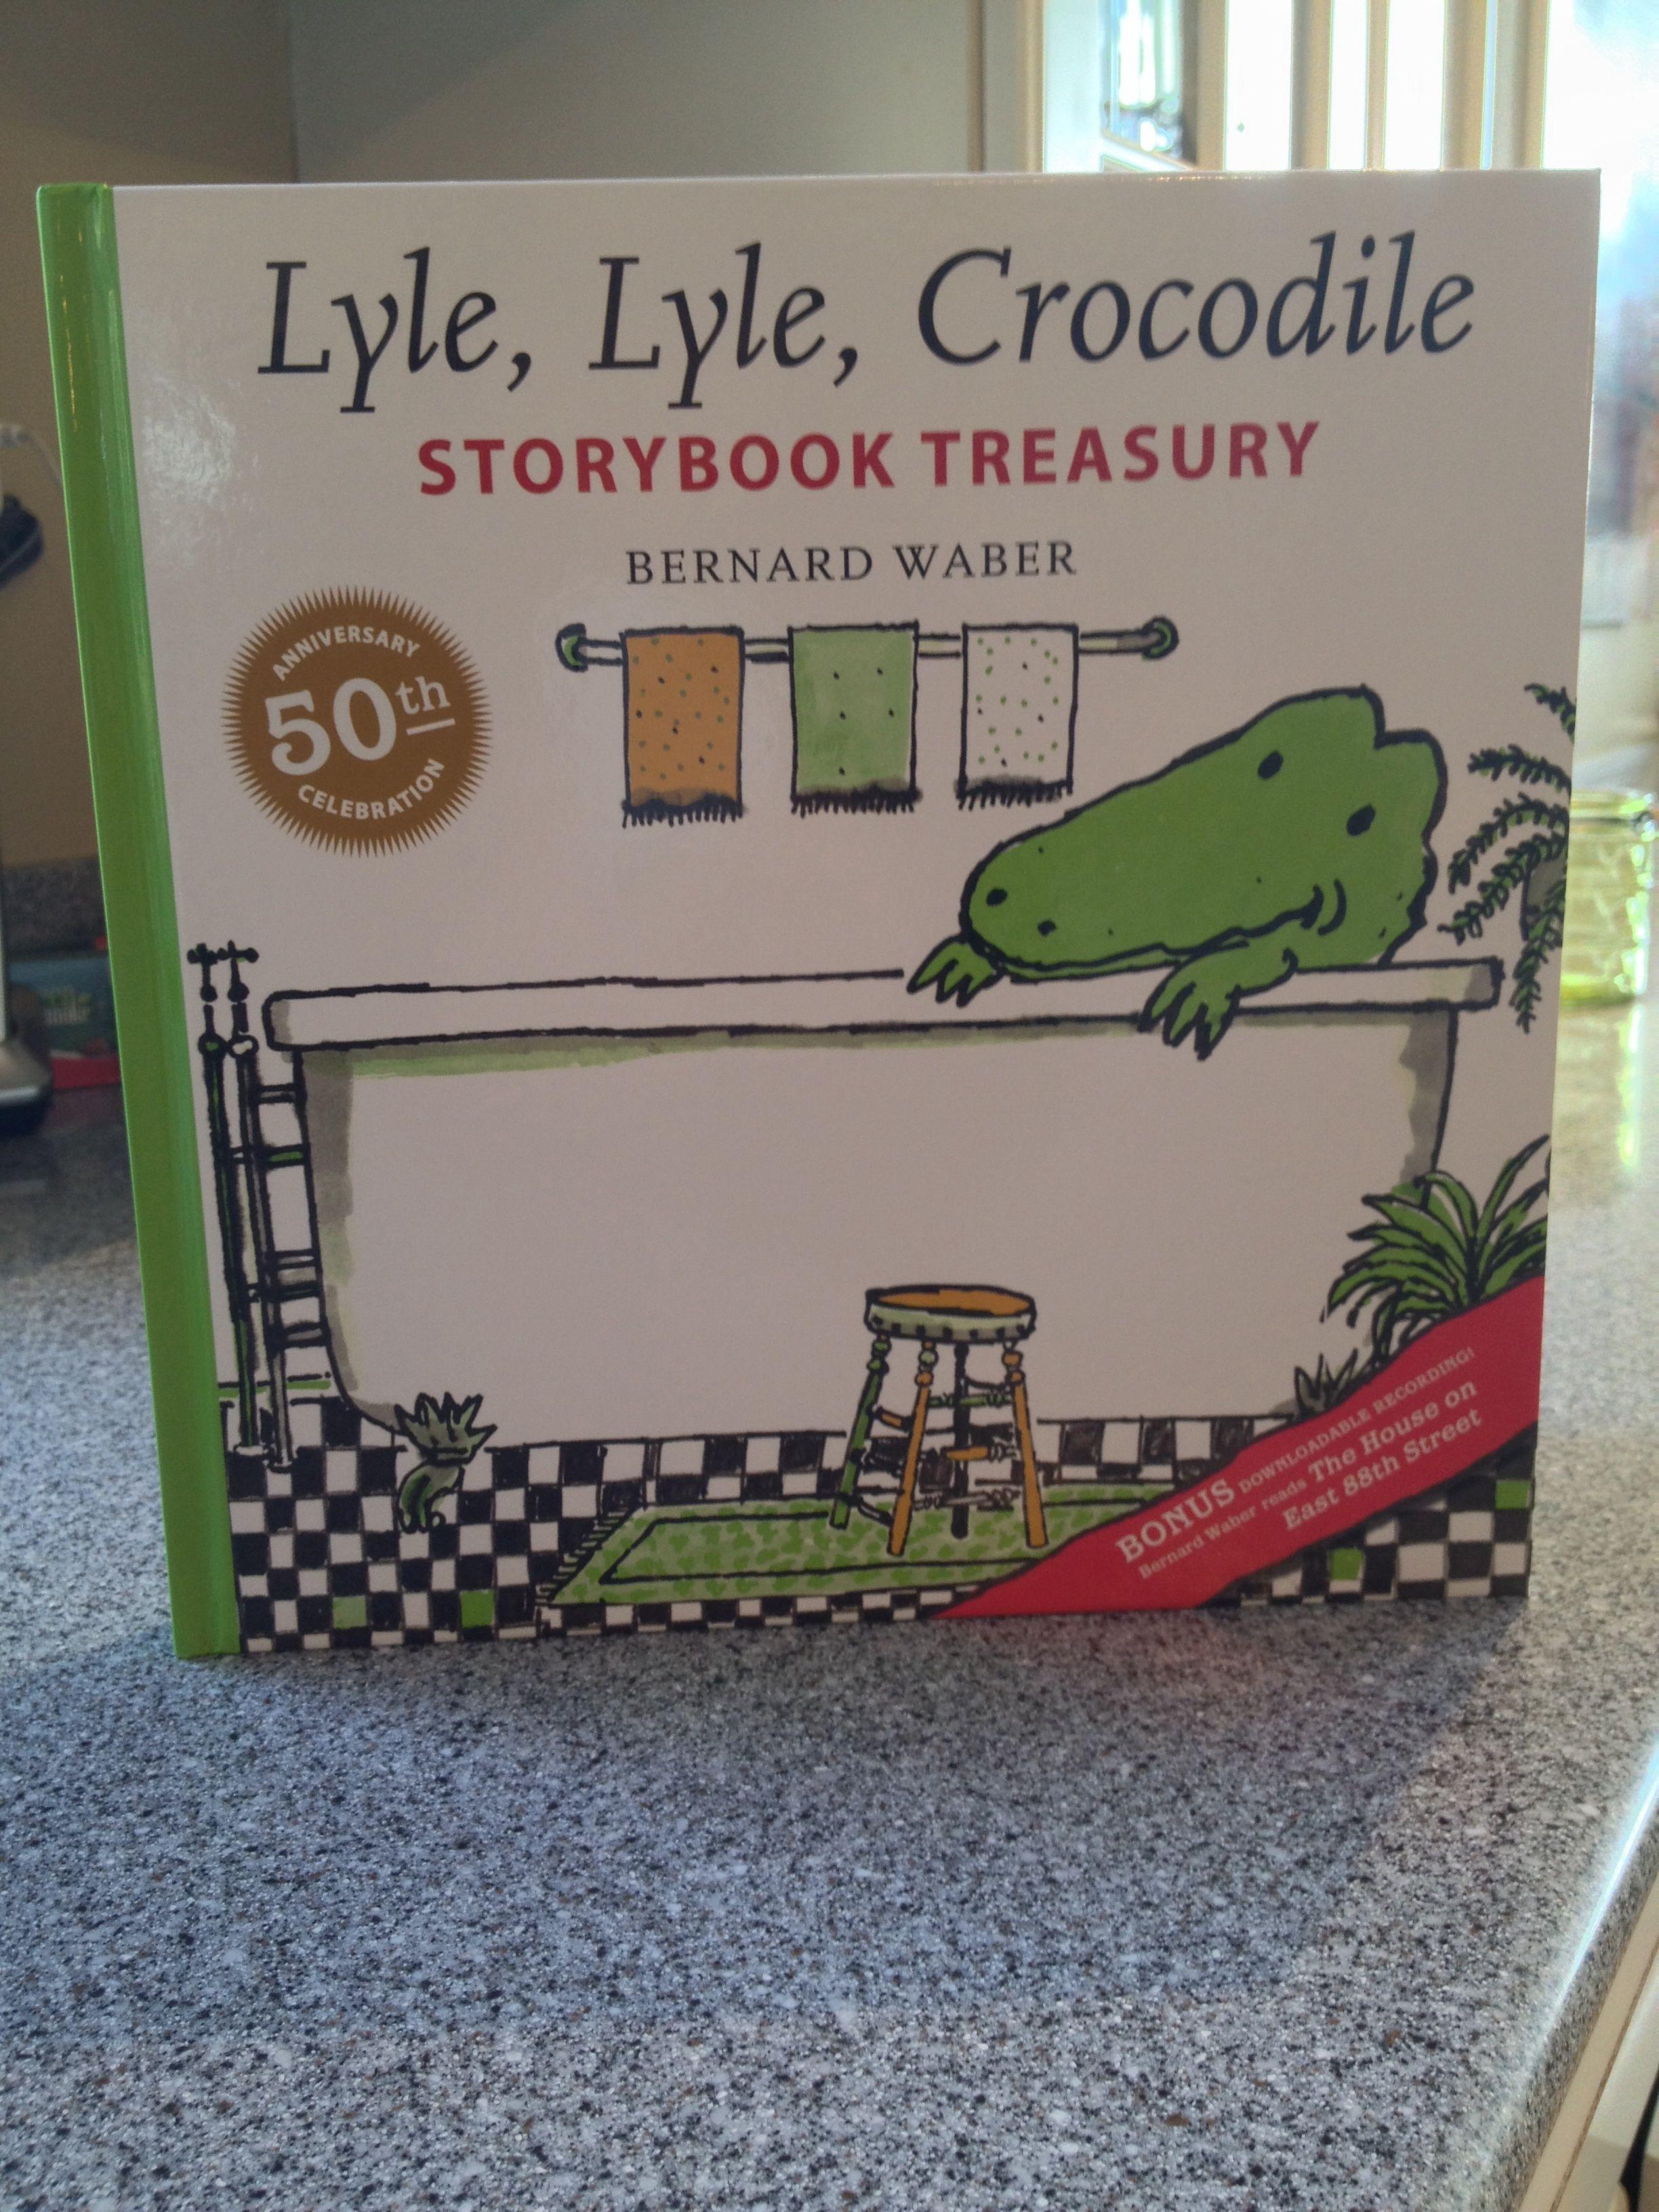 Guest Book - Lyle, Lyle, Crocodile by Bernard Waber